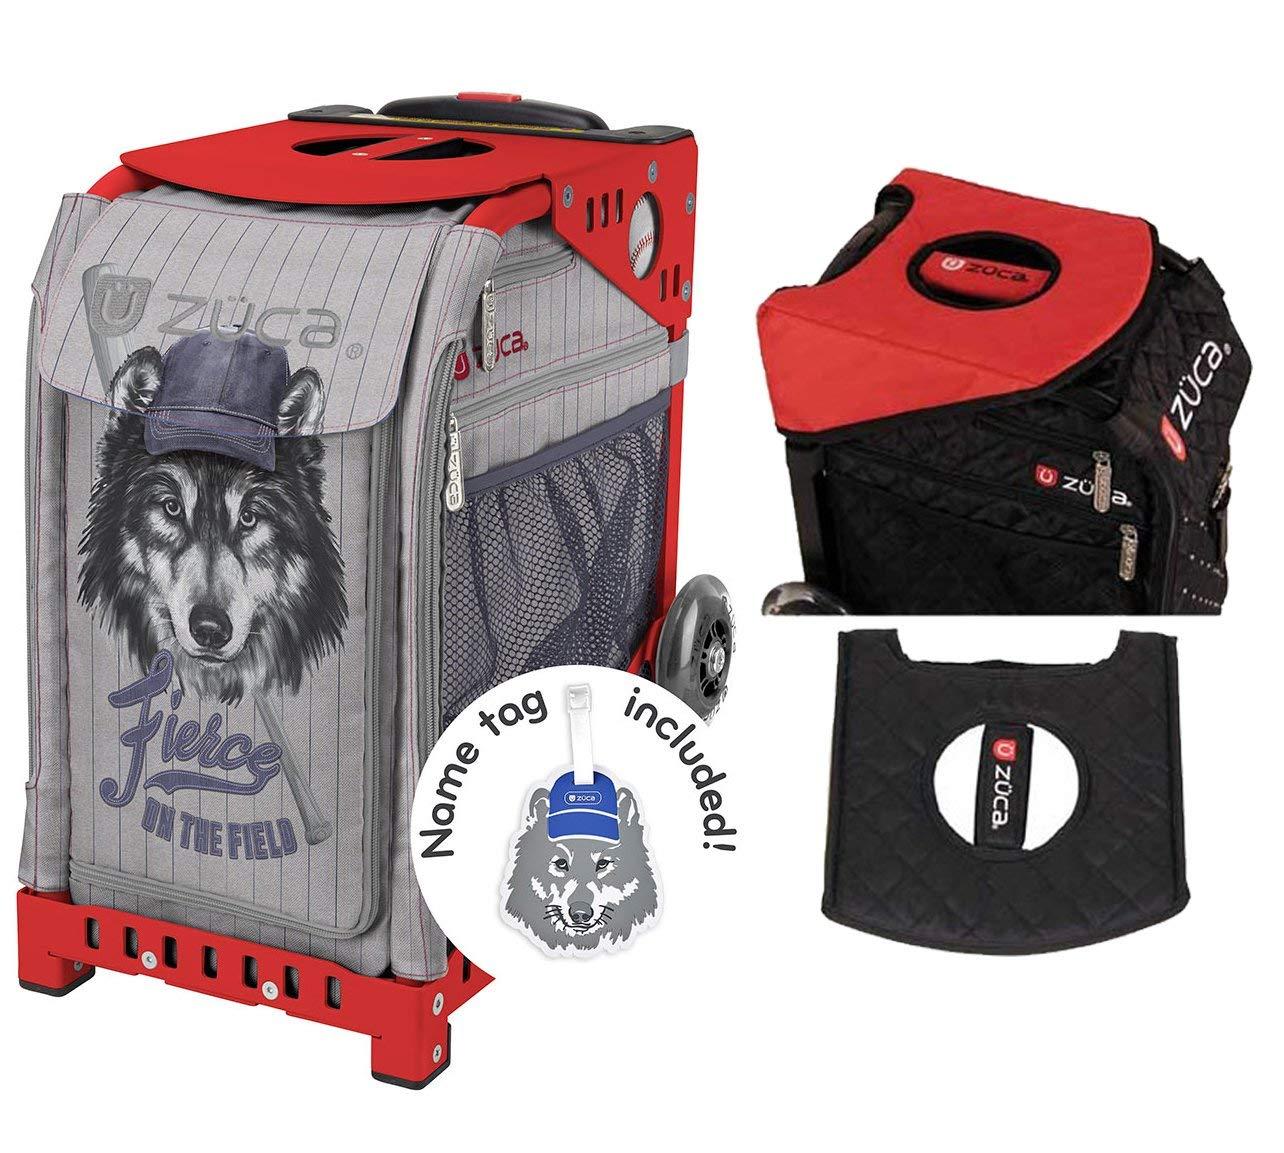 ZUCA Fierce On The Field Sport Insert Bag & Red Frame + Gift Seat Cushion